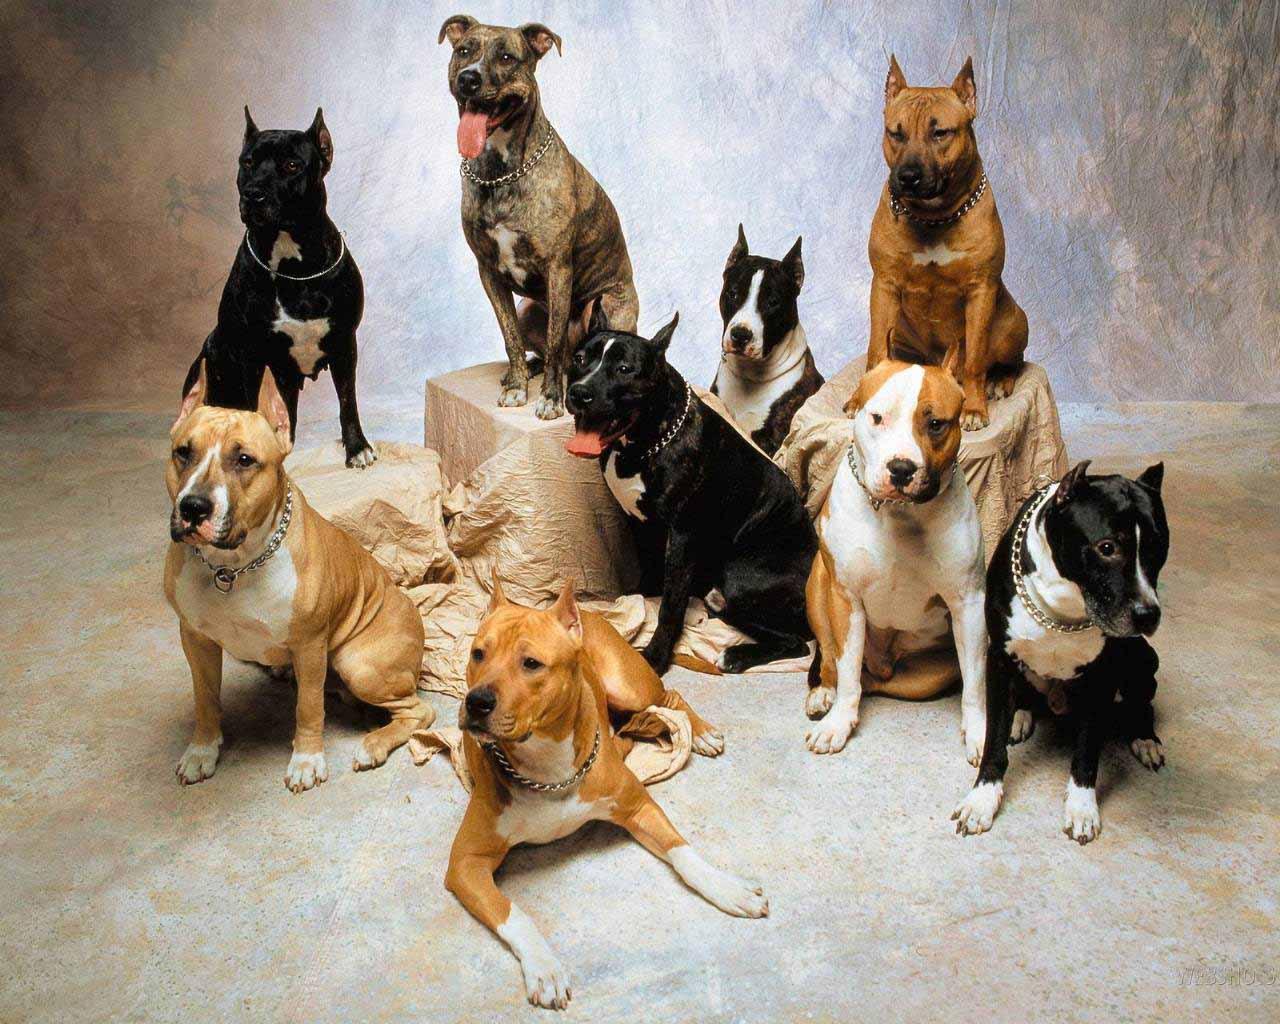 HD Wallpapers Pitbull Dog Wallpapers 1280x1024